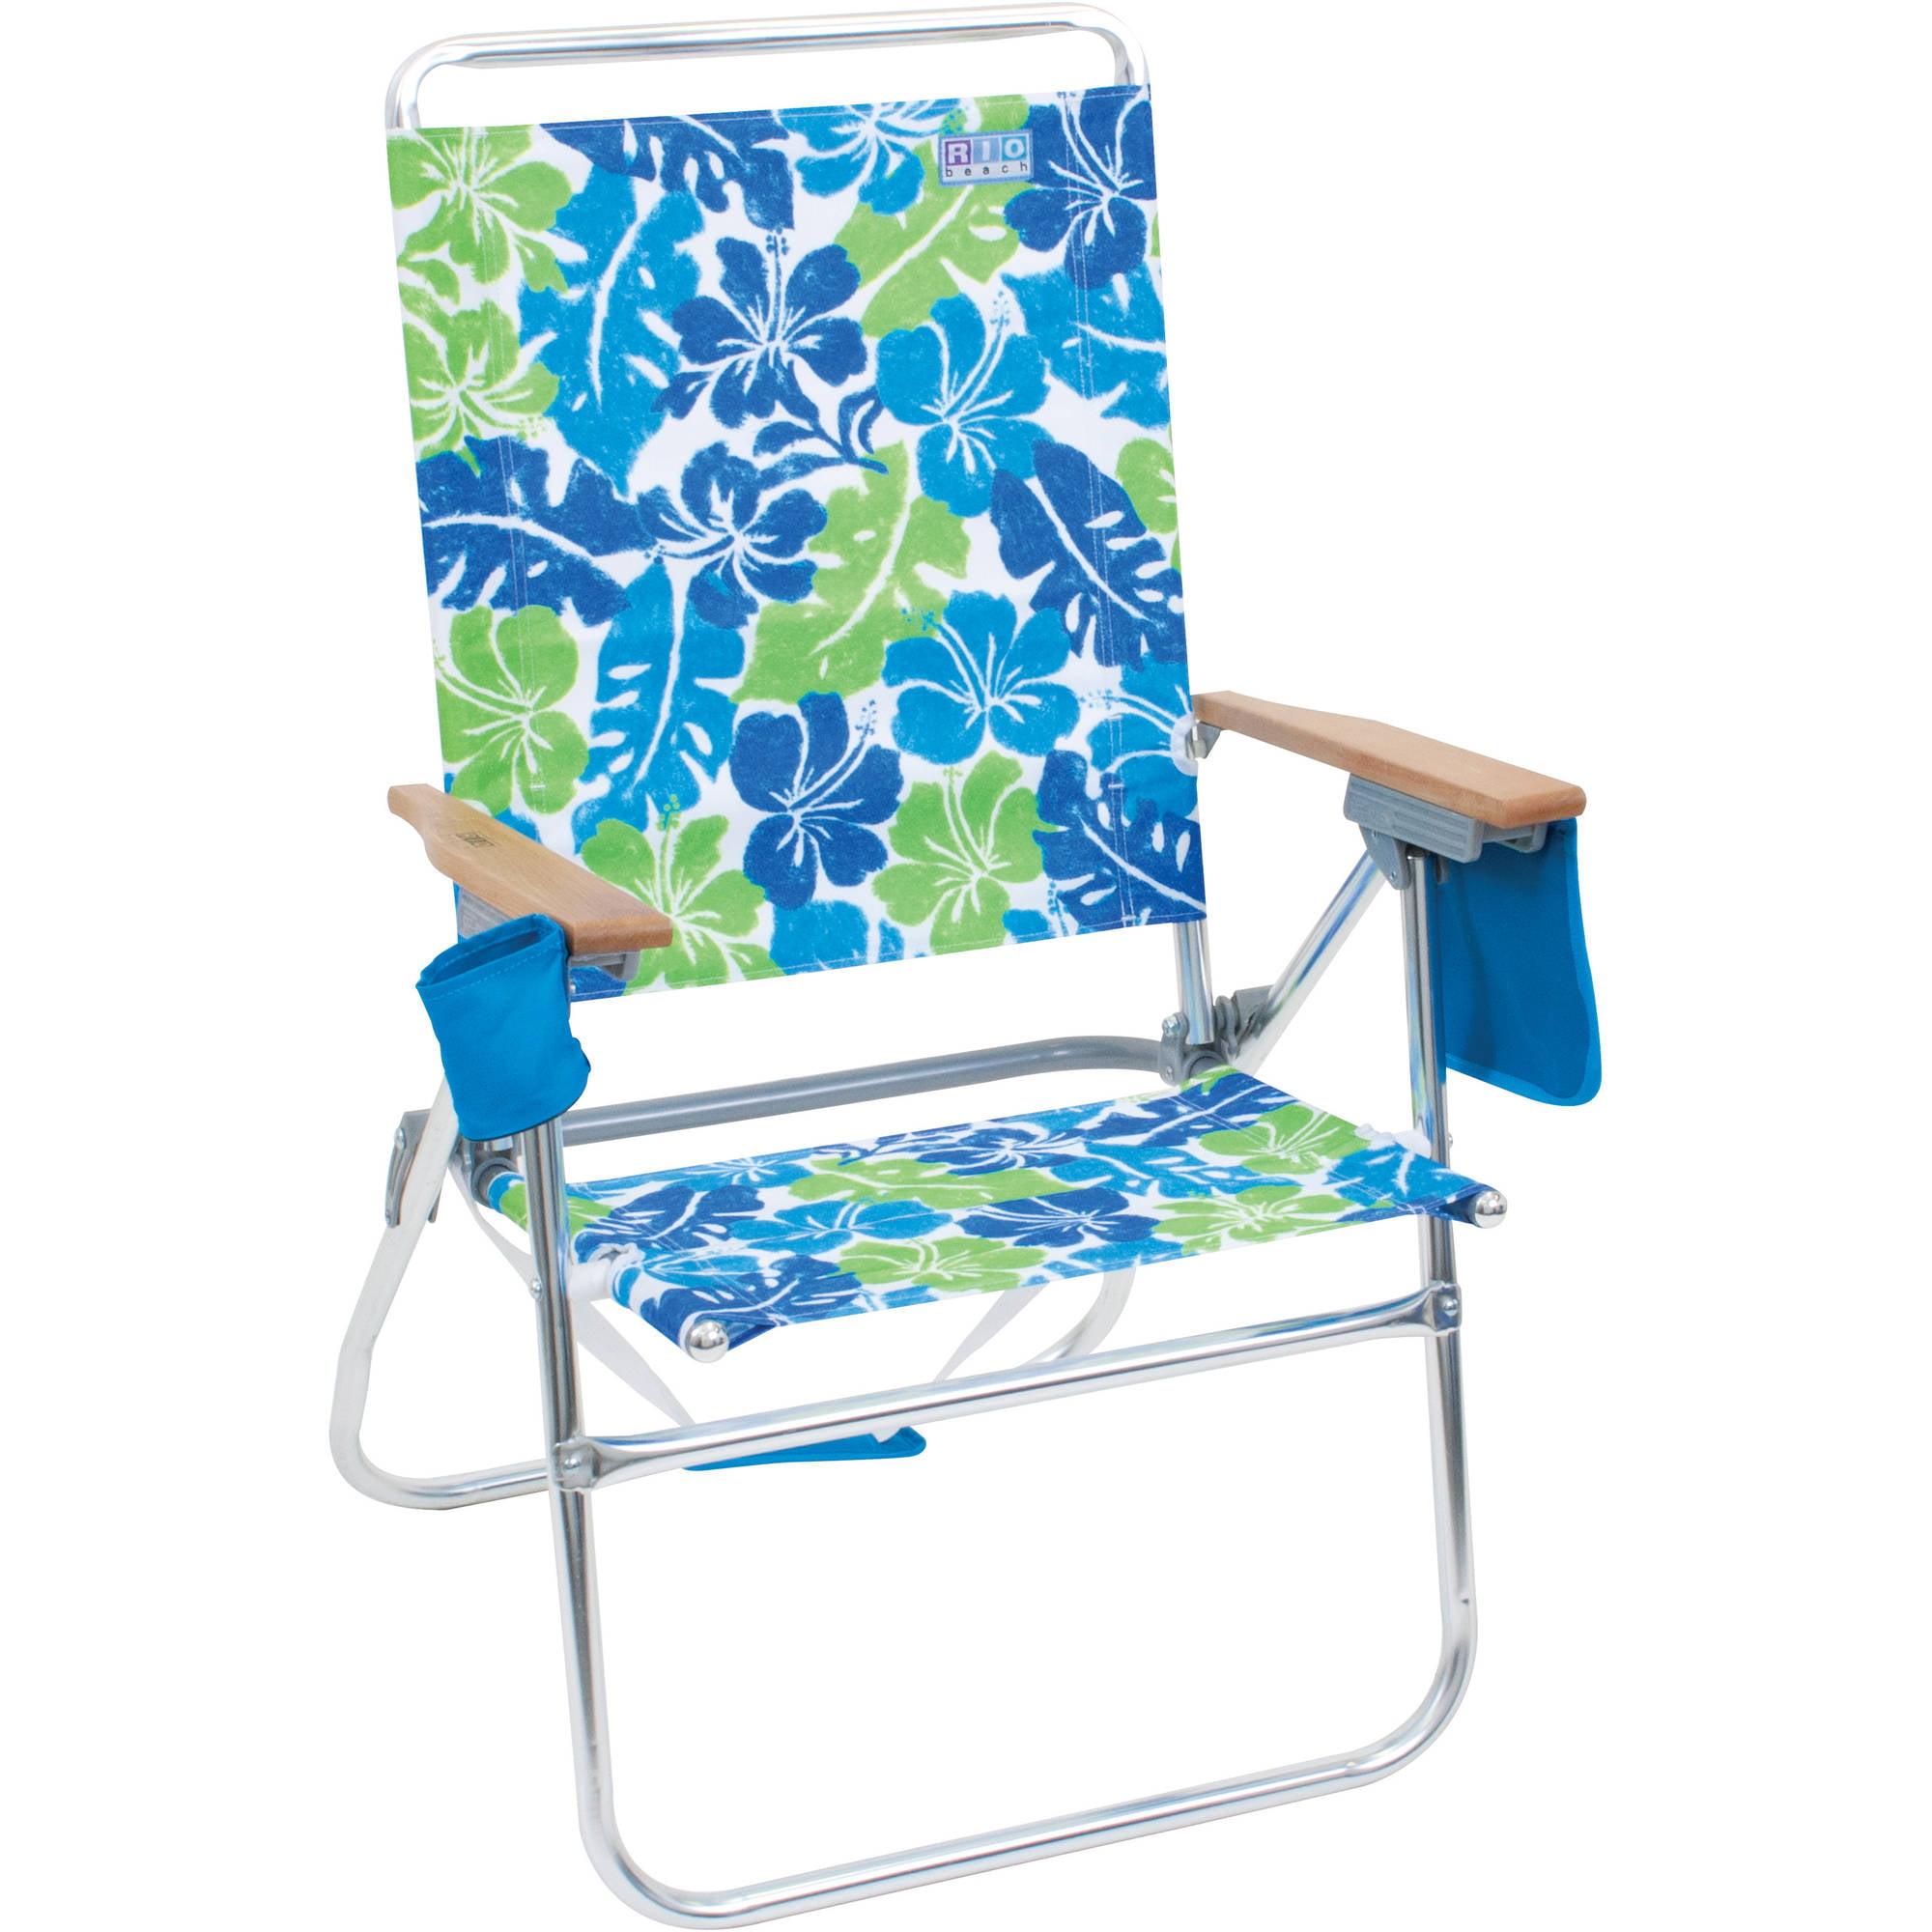 RIO Beach Deluxe Hi-Boy Chair